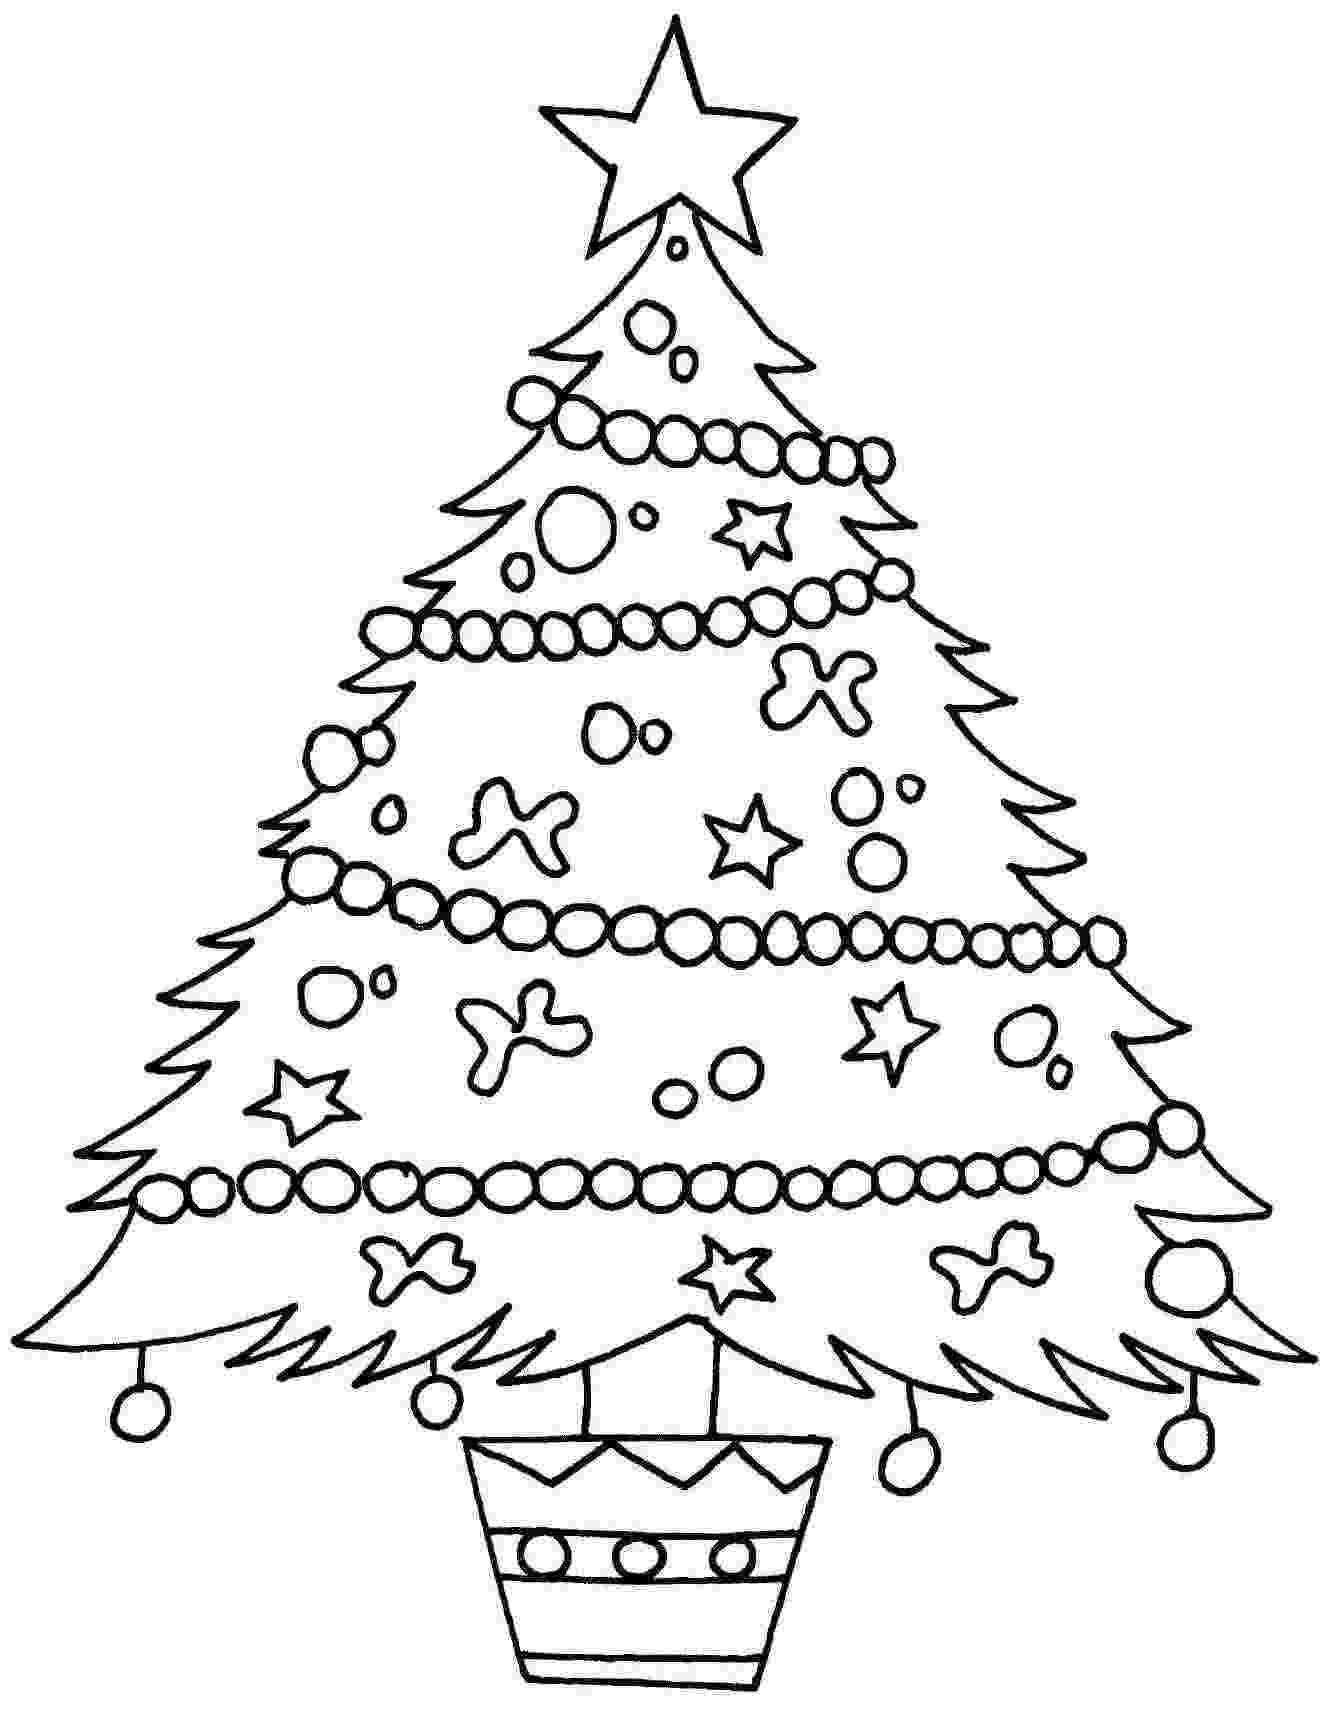 coloring christmas tree free printable christmas tree coloring pages for kids christmas coloring tree 1 1